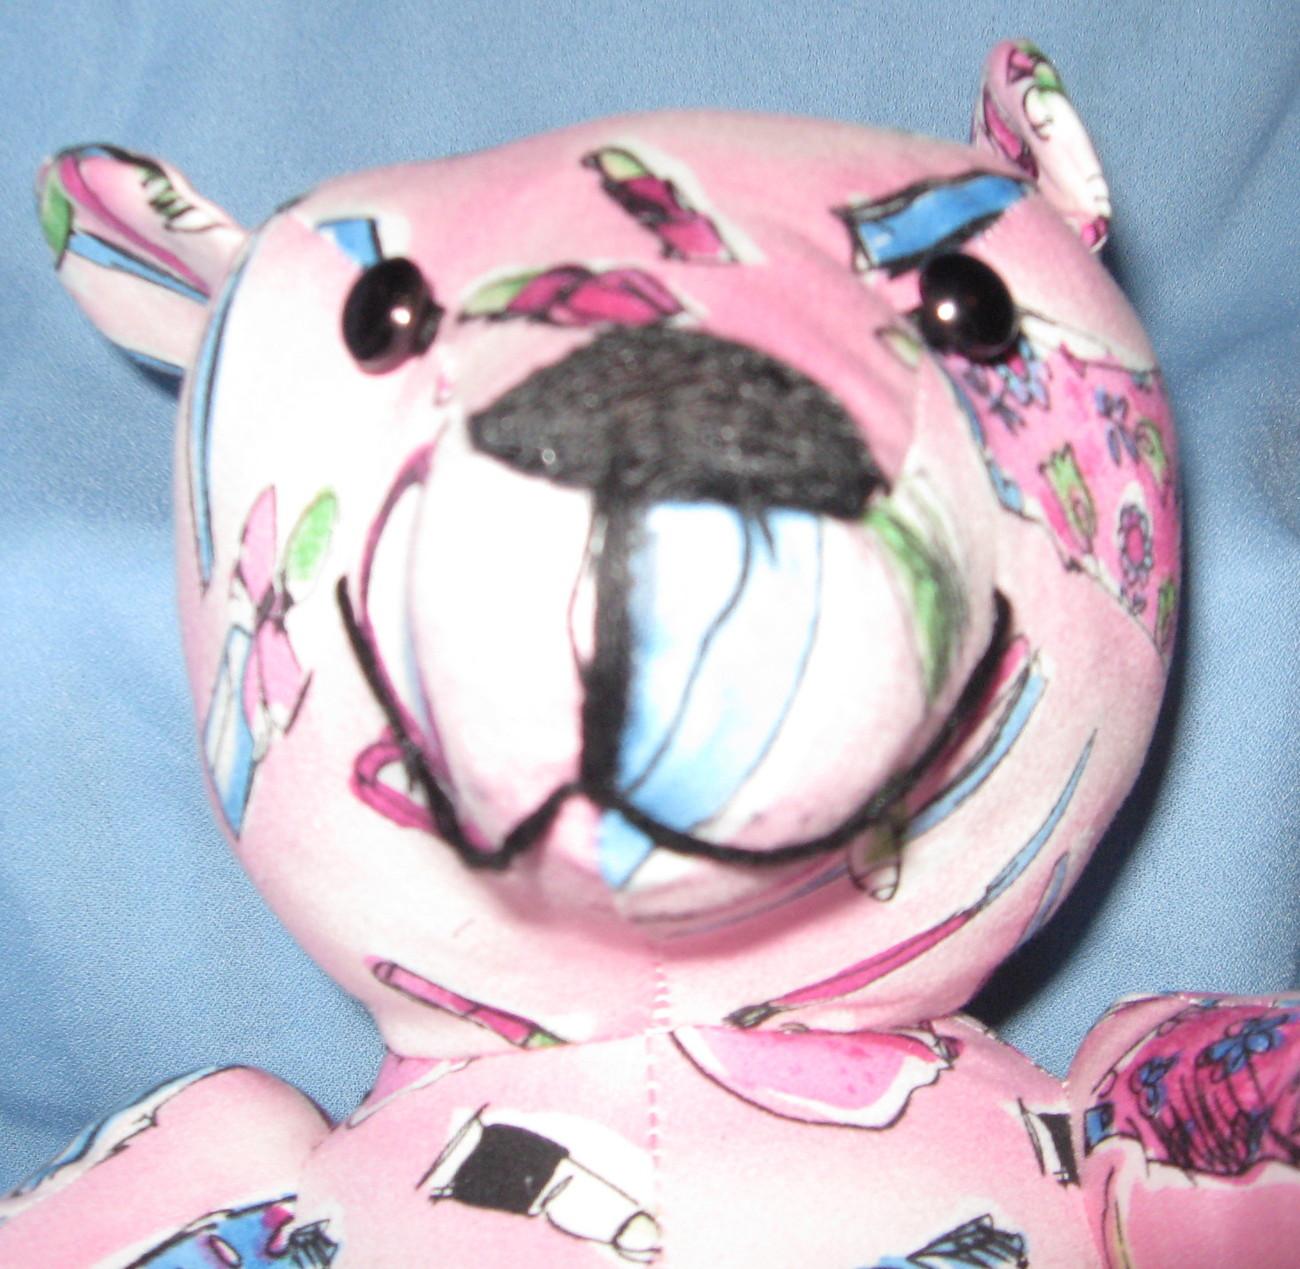 Stuffed toy Bear Pink fabric Handbag Makeup Dress handcrafted OOAK handmade PB1